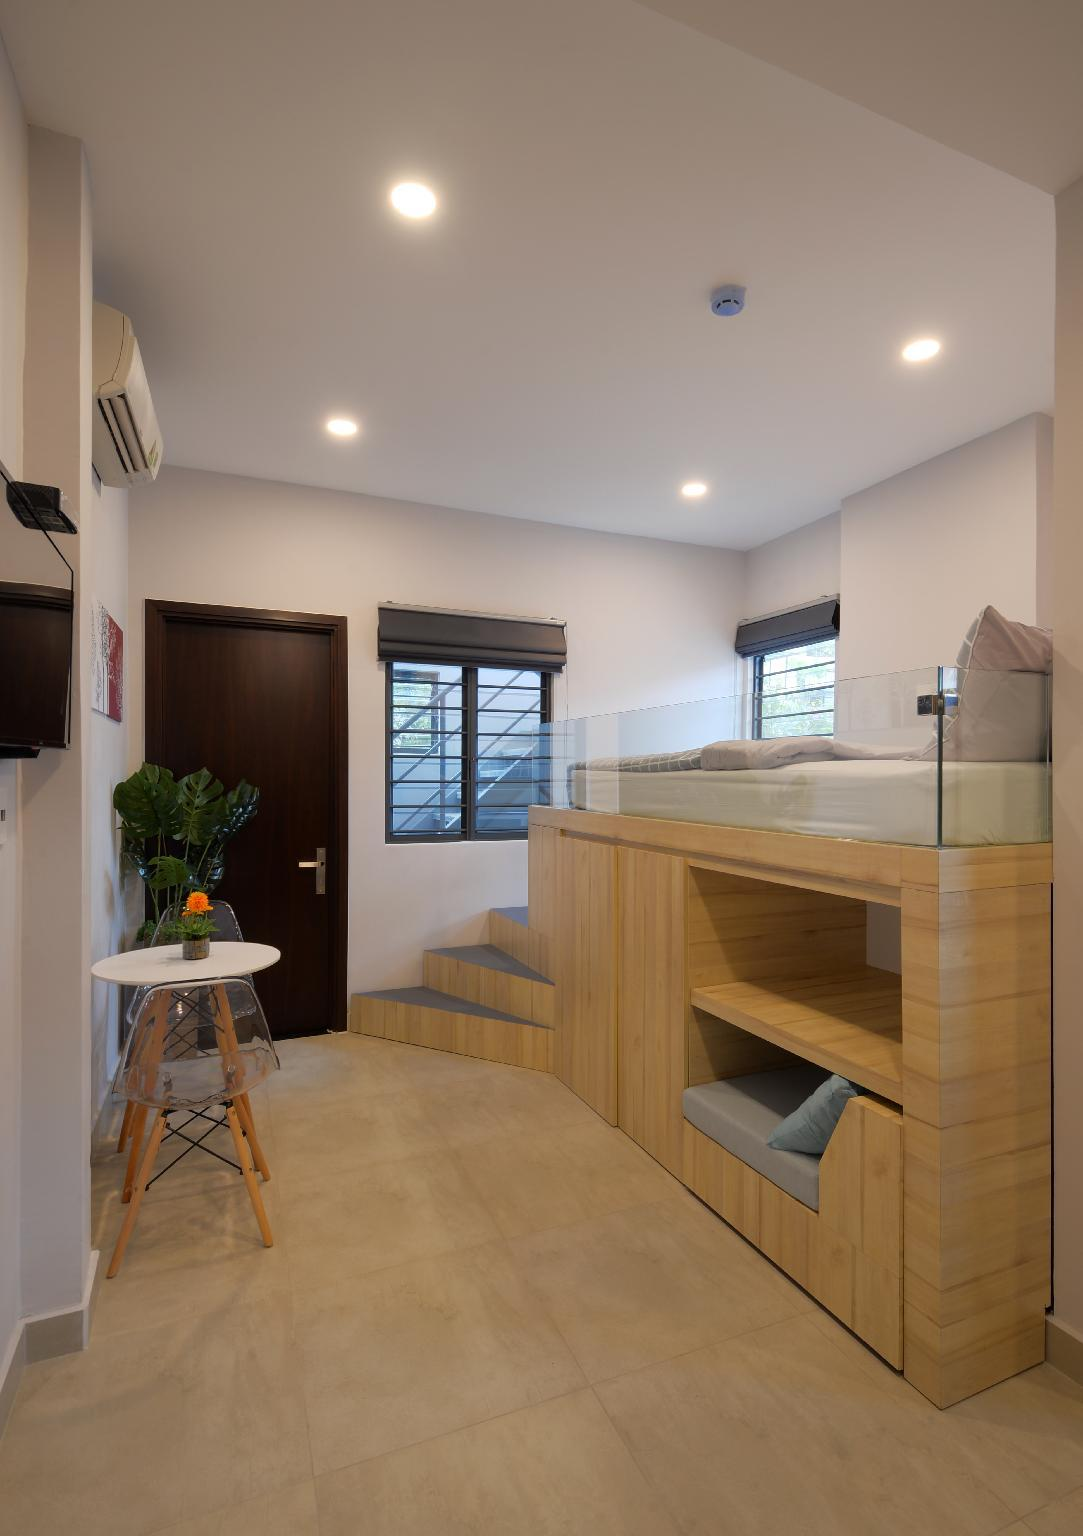 Babylon Garden Serviced Apartment Standard Studio